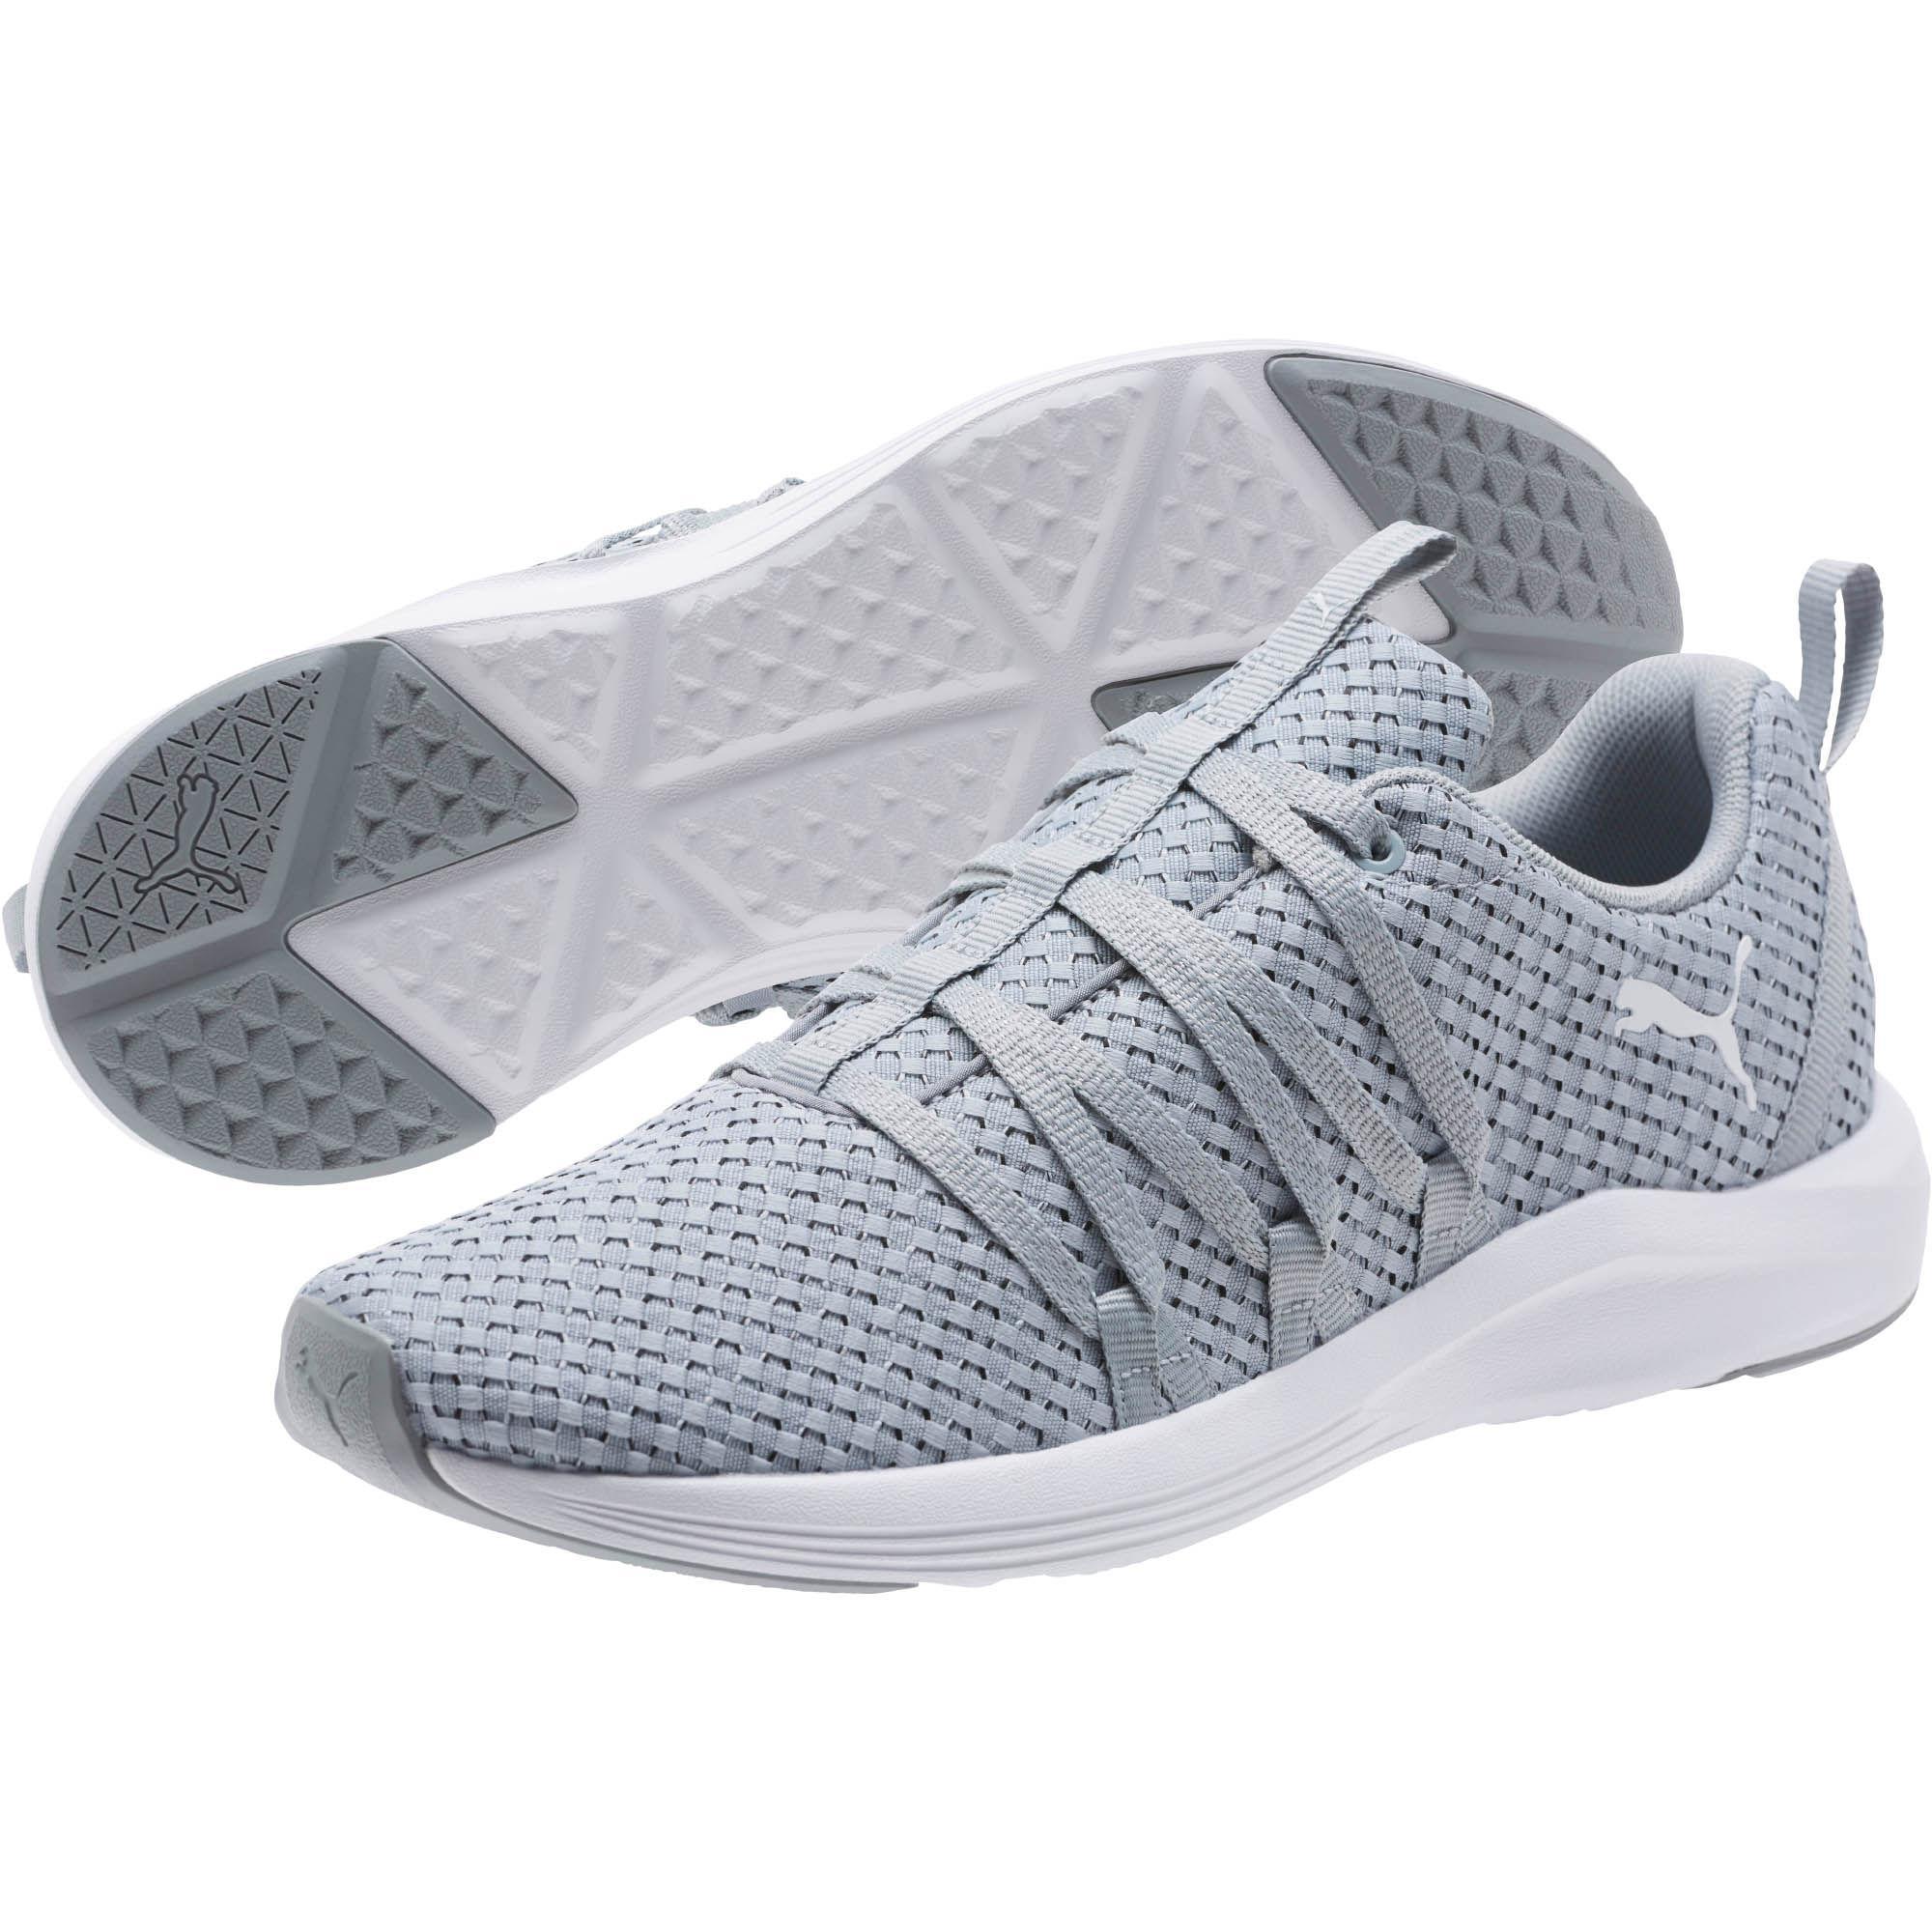 7a281e96b927 Lyst - PUMA Prowl Alt Weave Women s Training Shoes